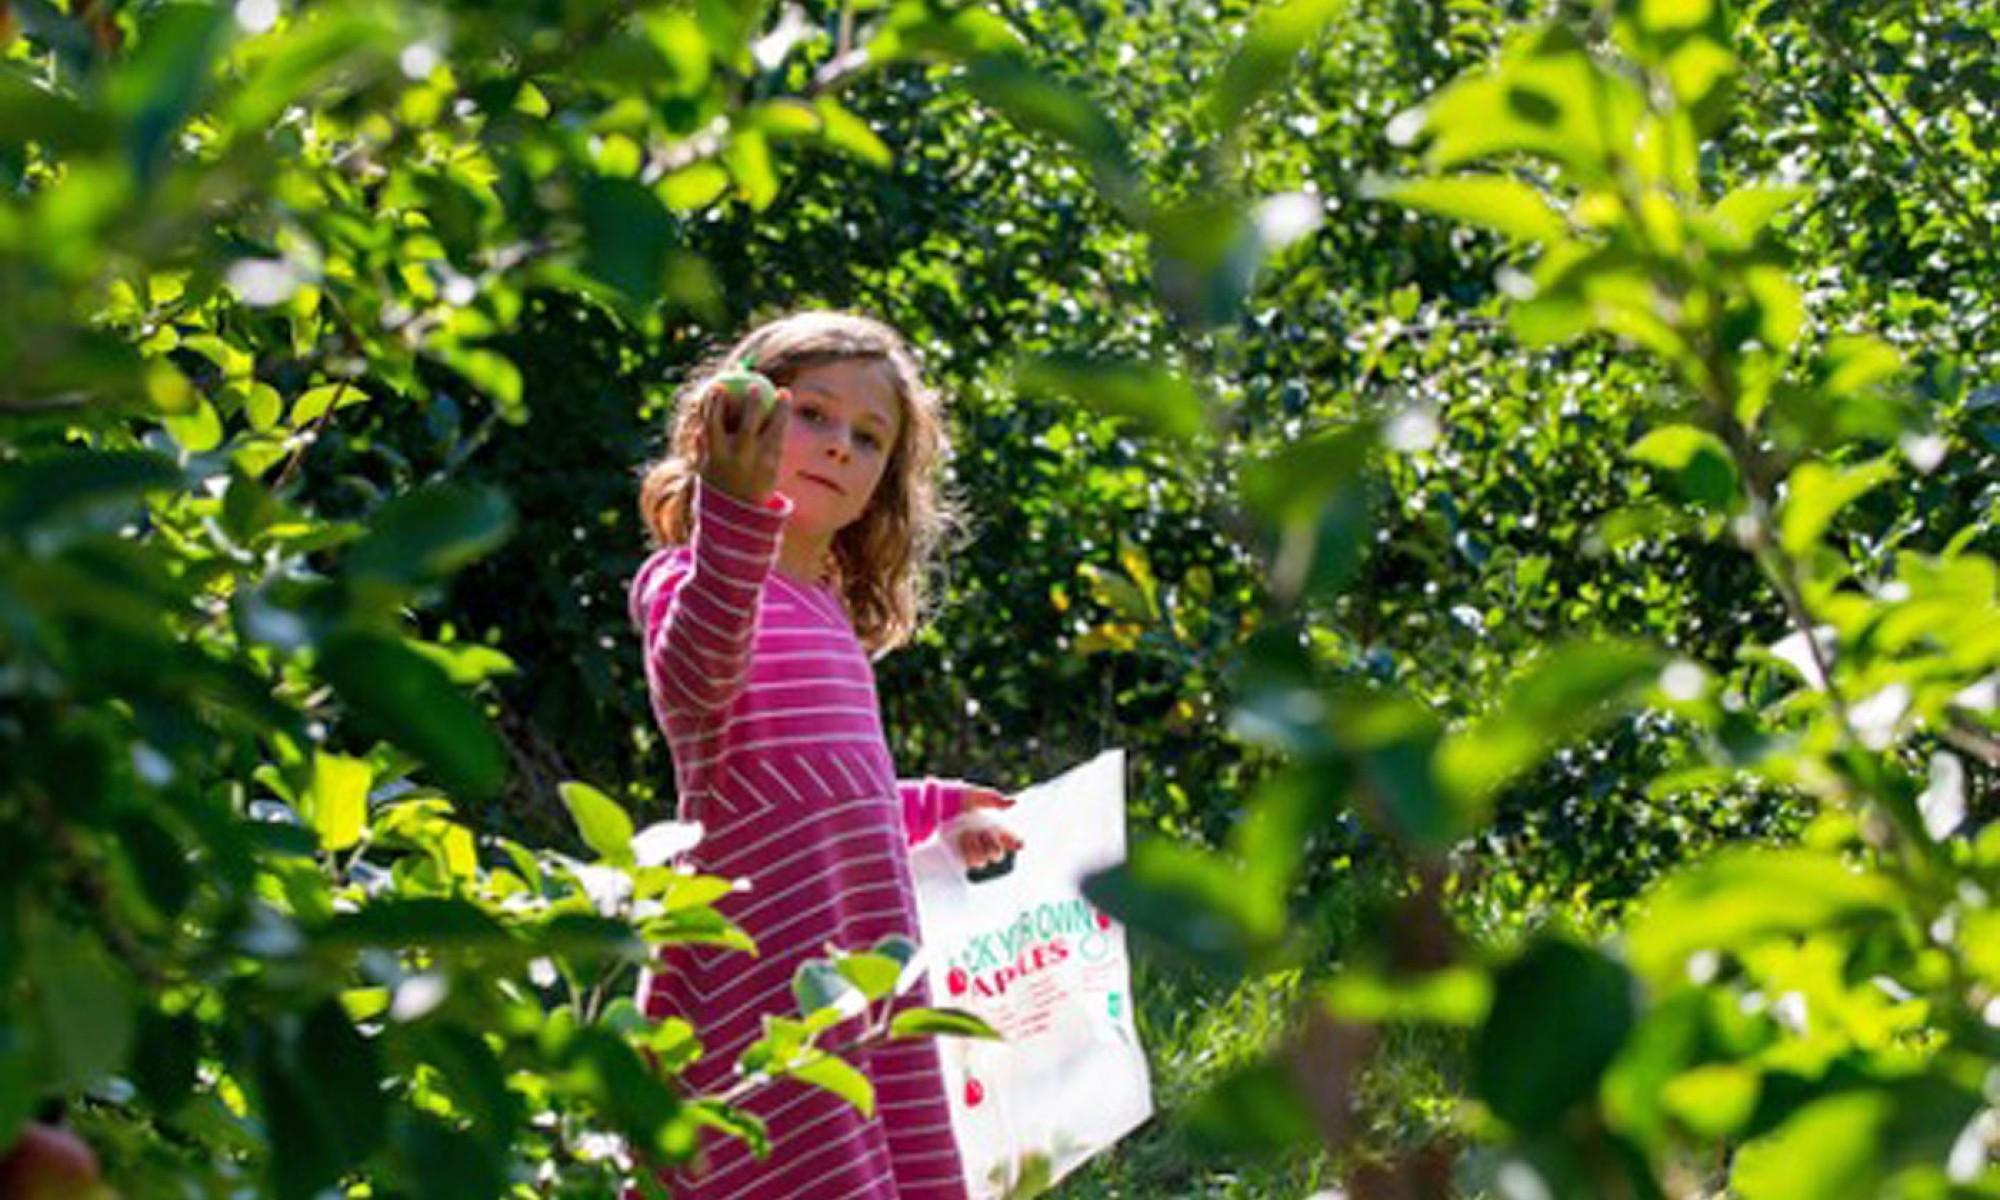 Apple picking at Farmer's Pantry